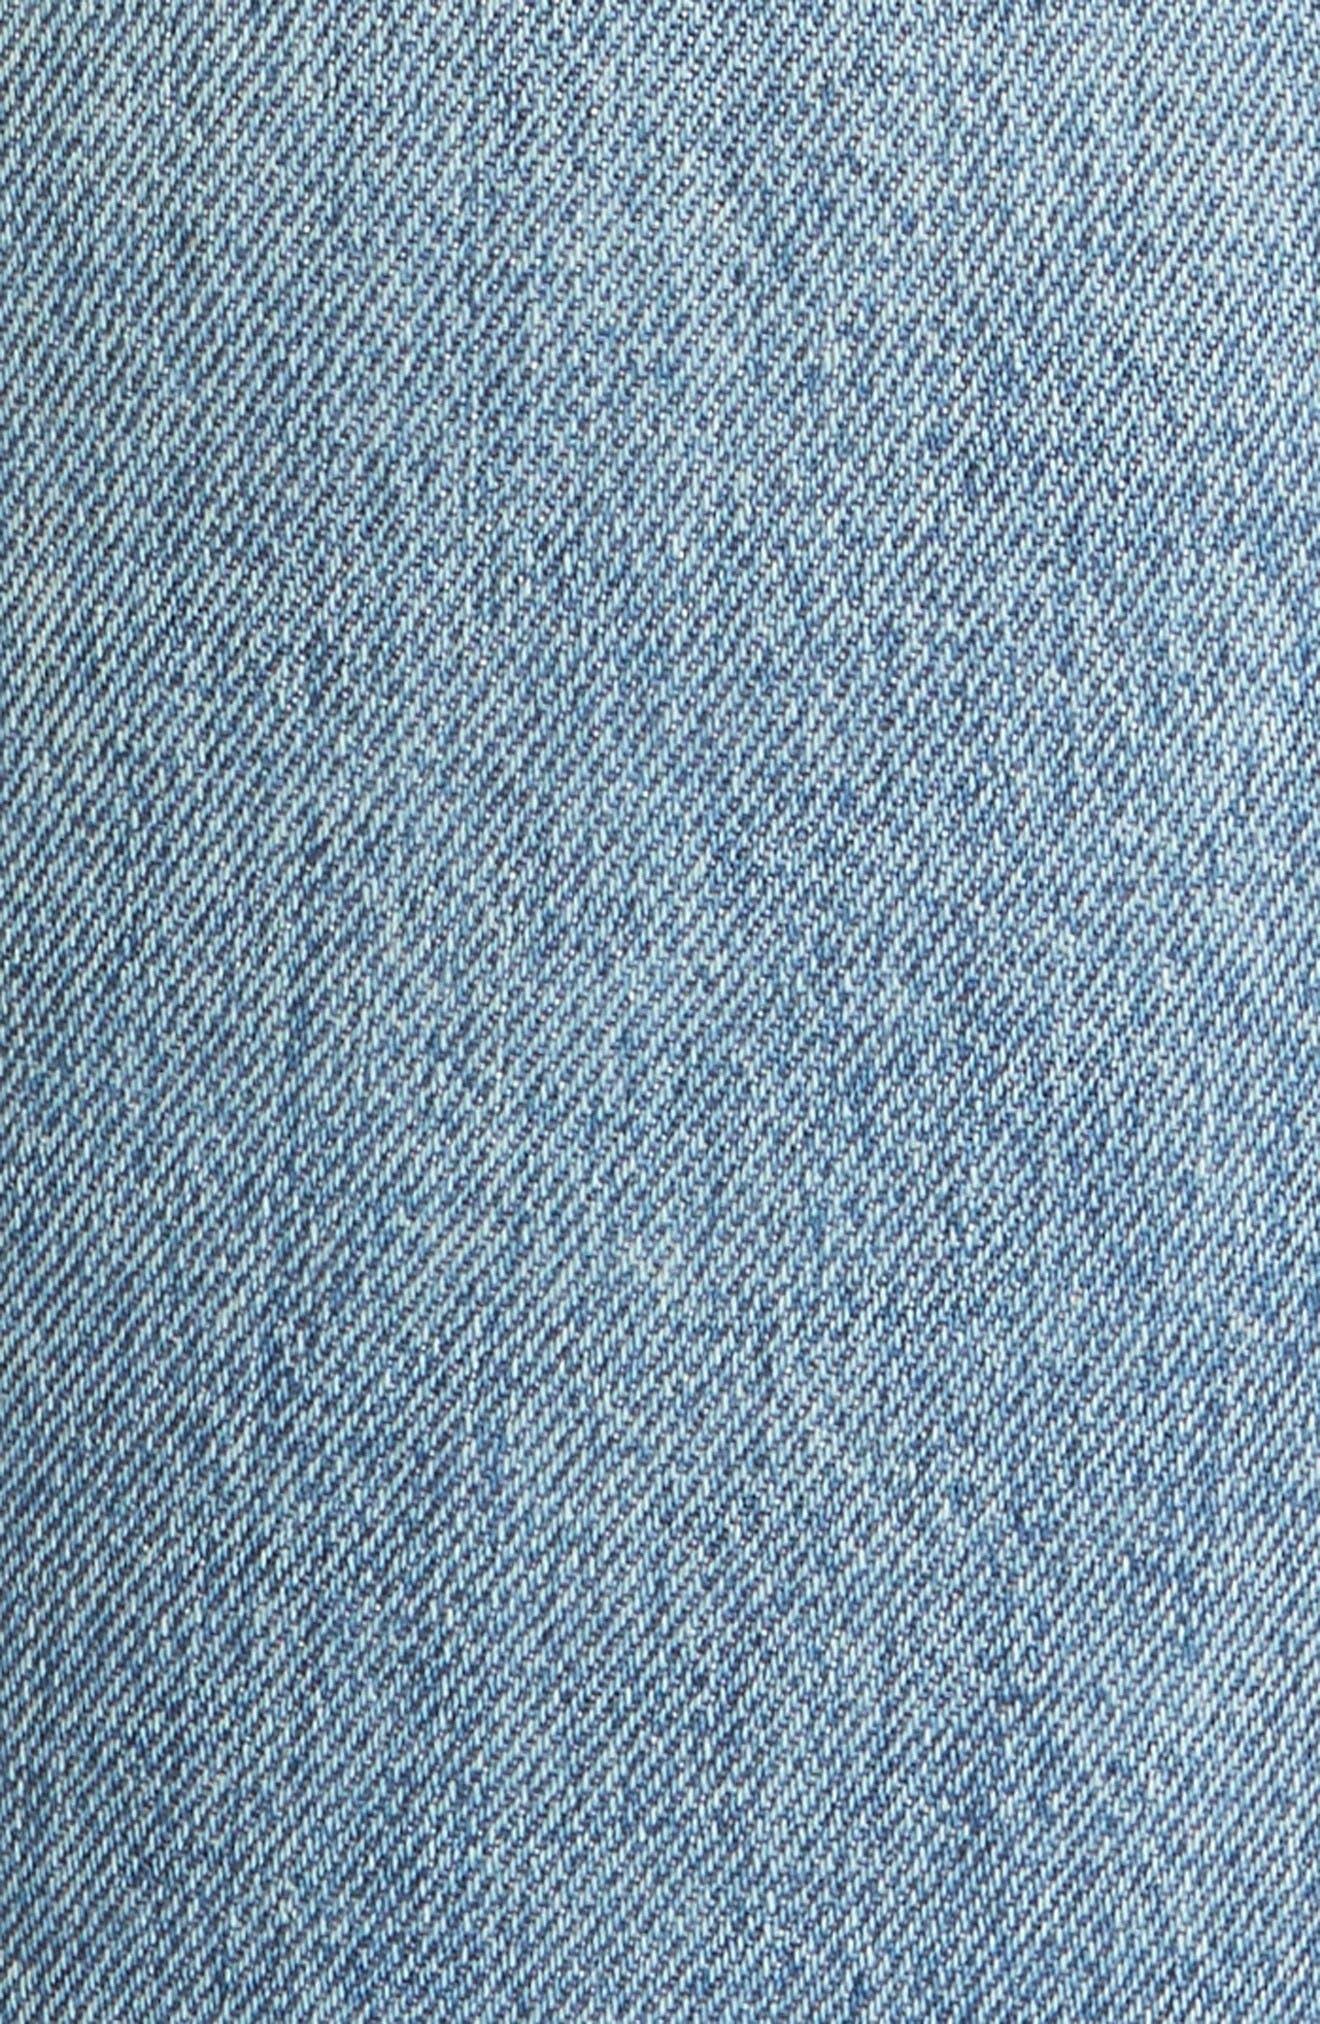 High Waist Vintage Straight Leg Jeans,                             Alternate thumbnail 5, color,                             Medium Wash